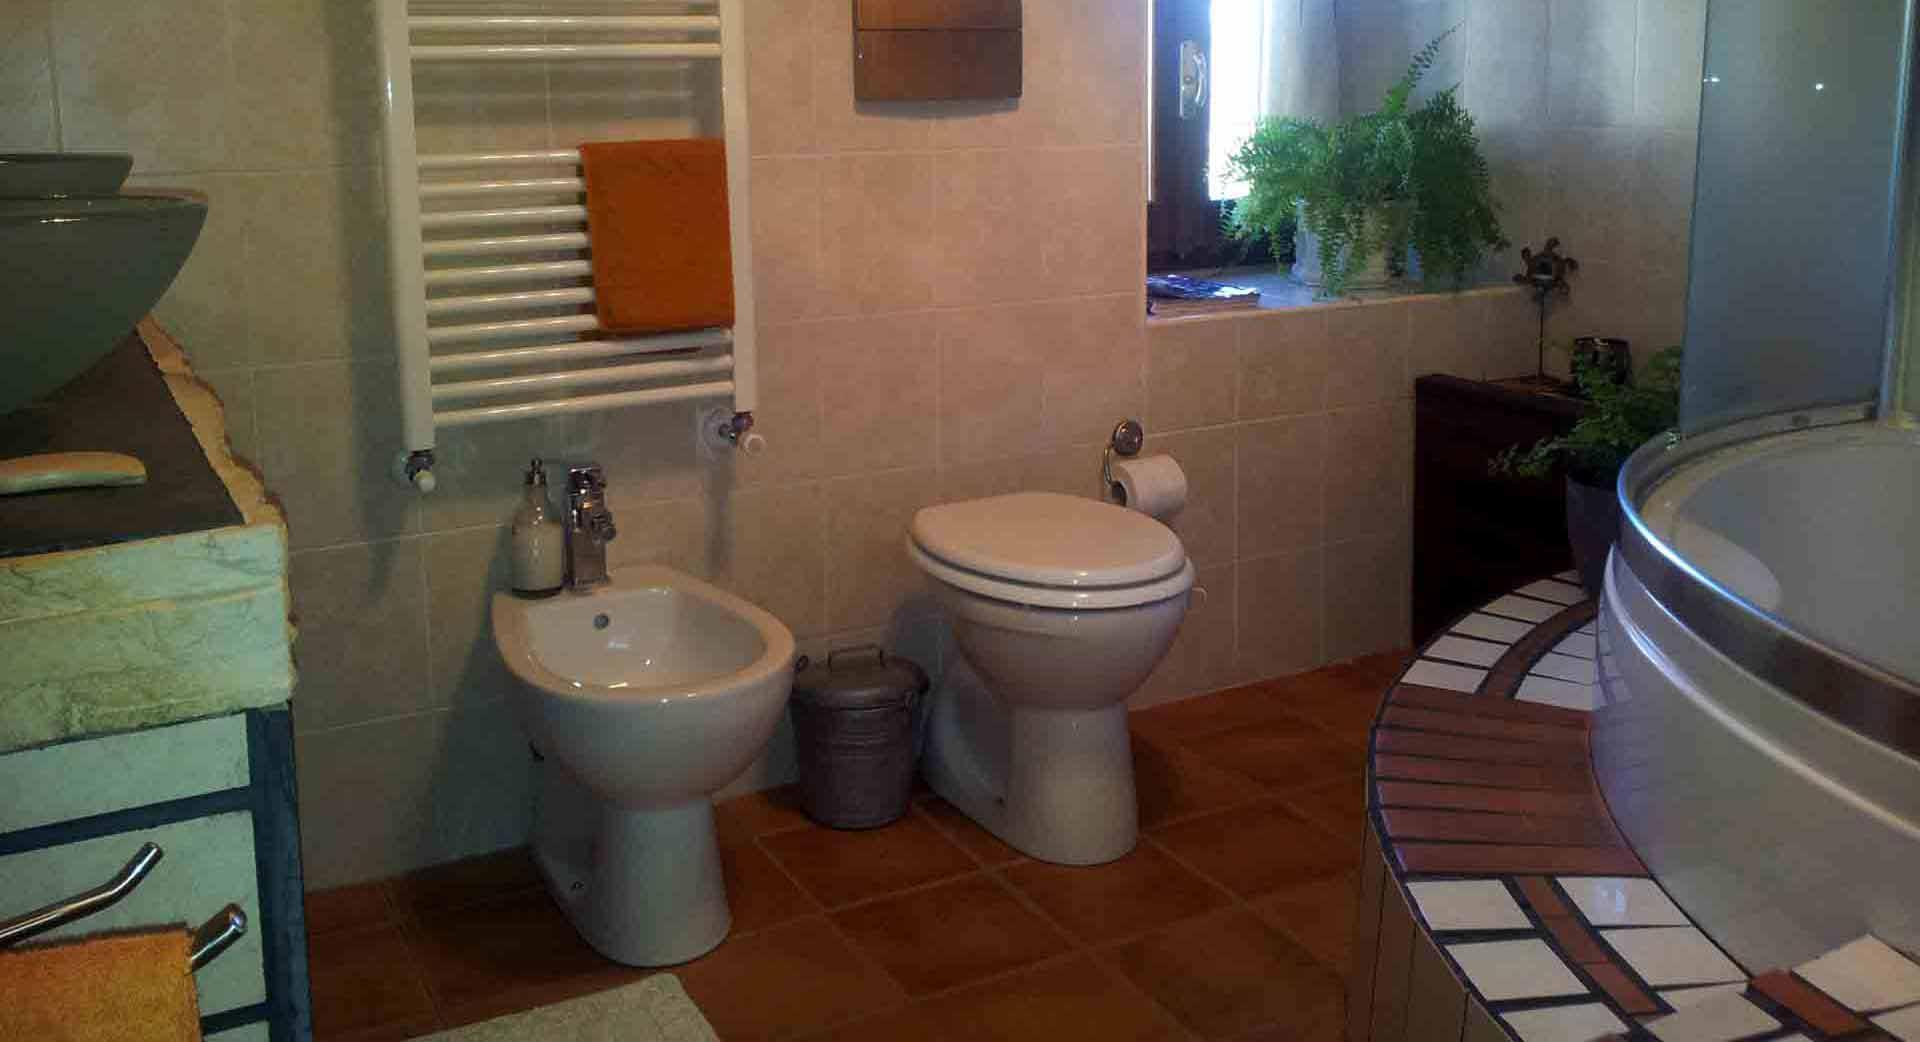 Bagno camera shabby sanitari vasca incasso B&B & meditation center Zorba il Buddha Passerano Marmorito Asti